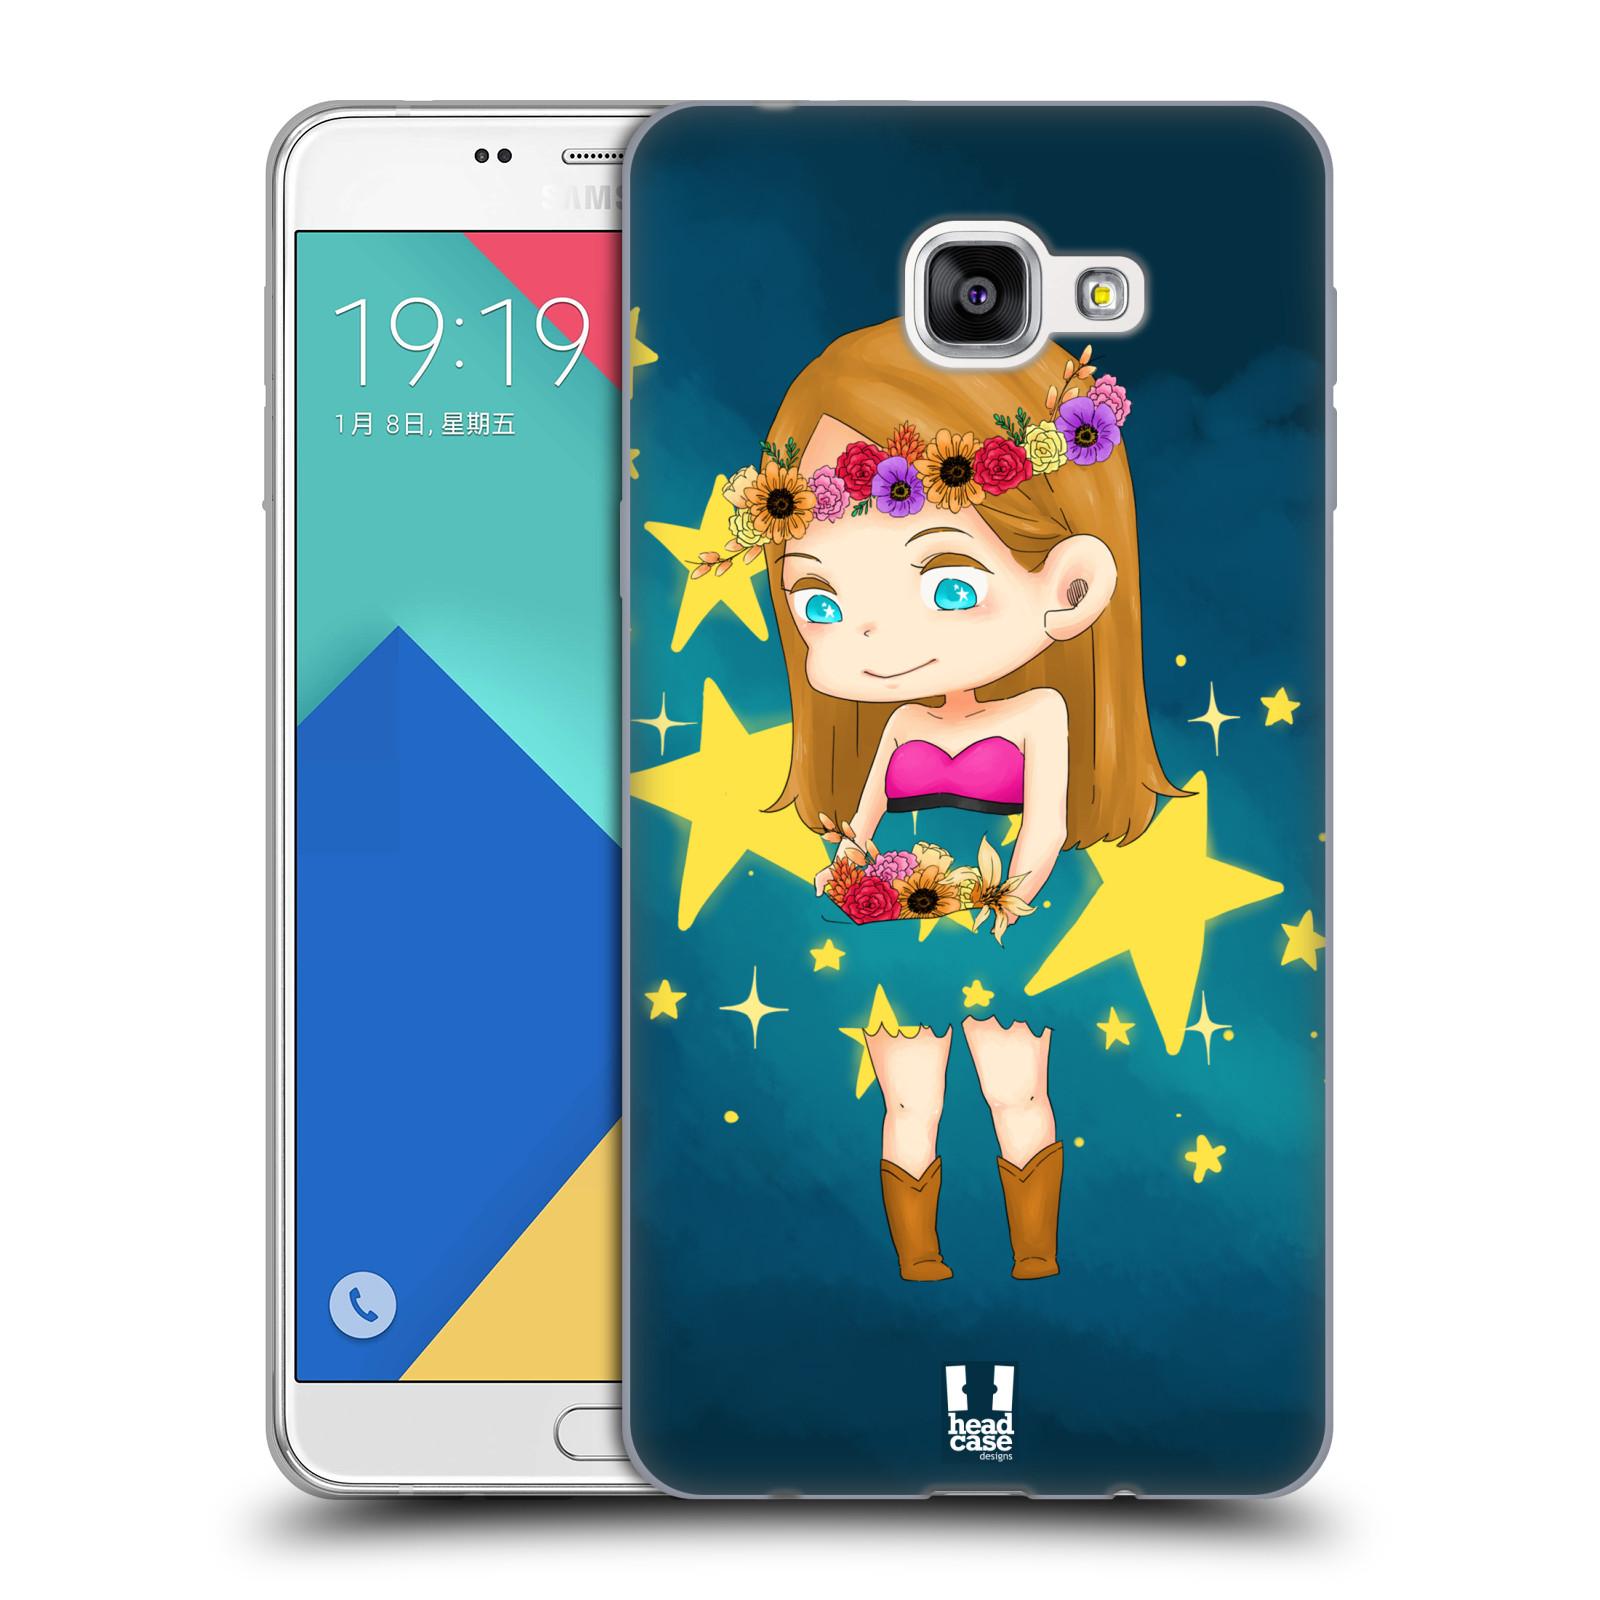 Pouzdro A Obal Na Mobil Head Case Silikonovy Obal Na Mobil Samsung